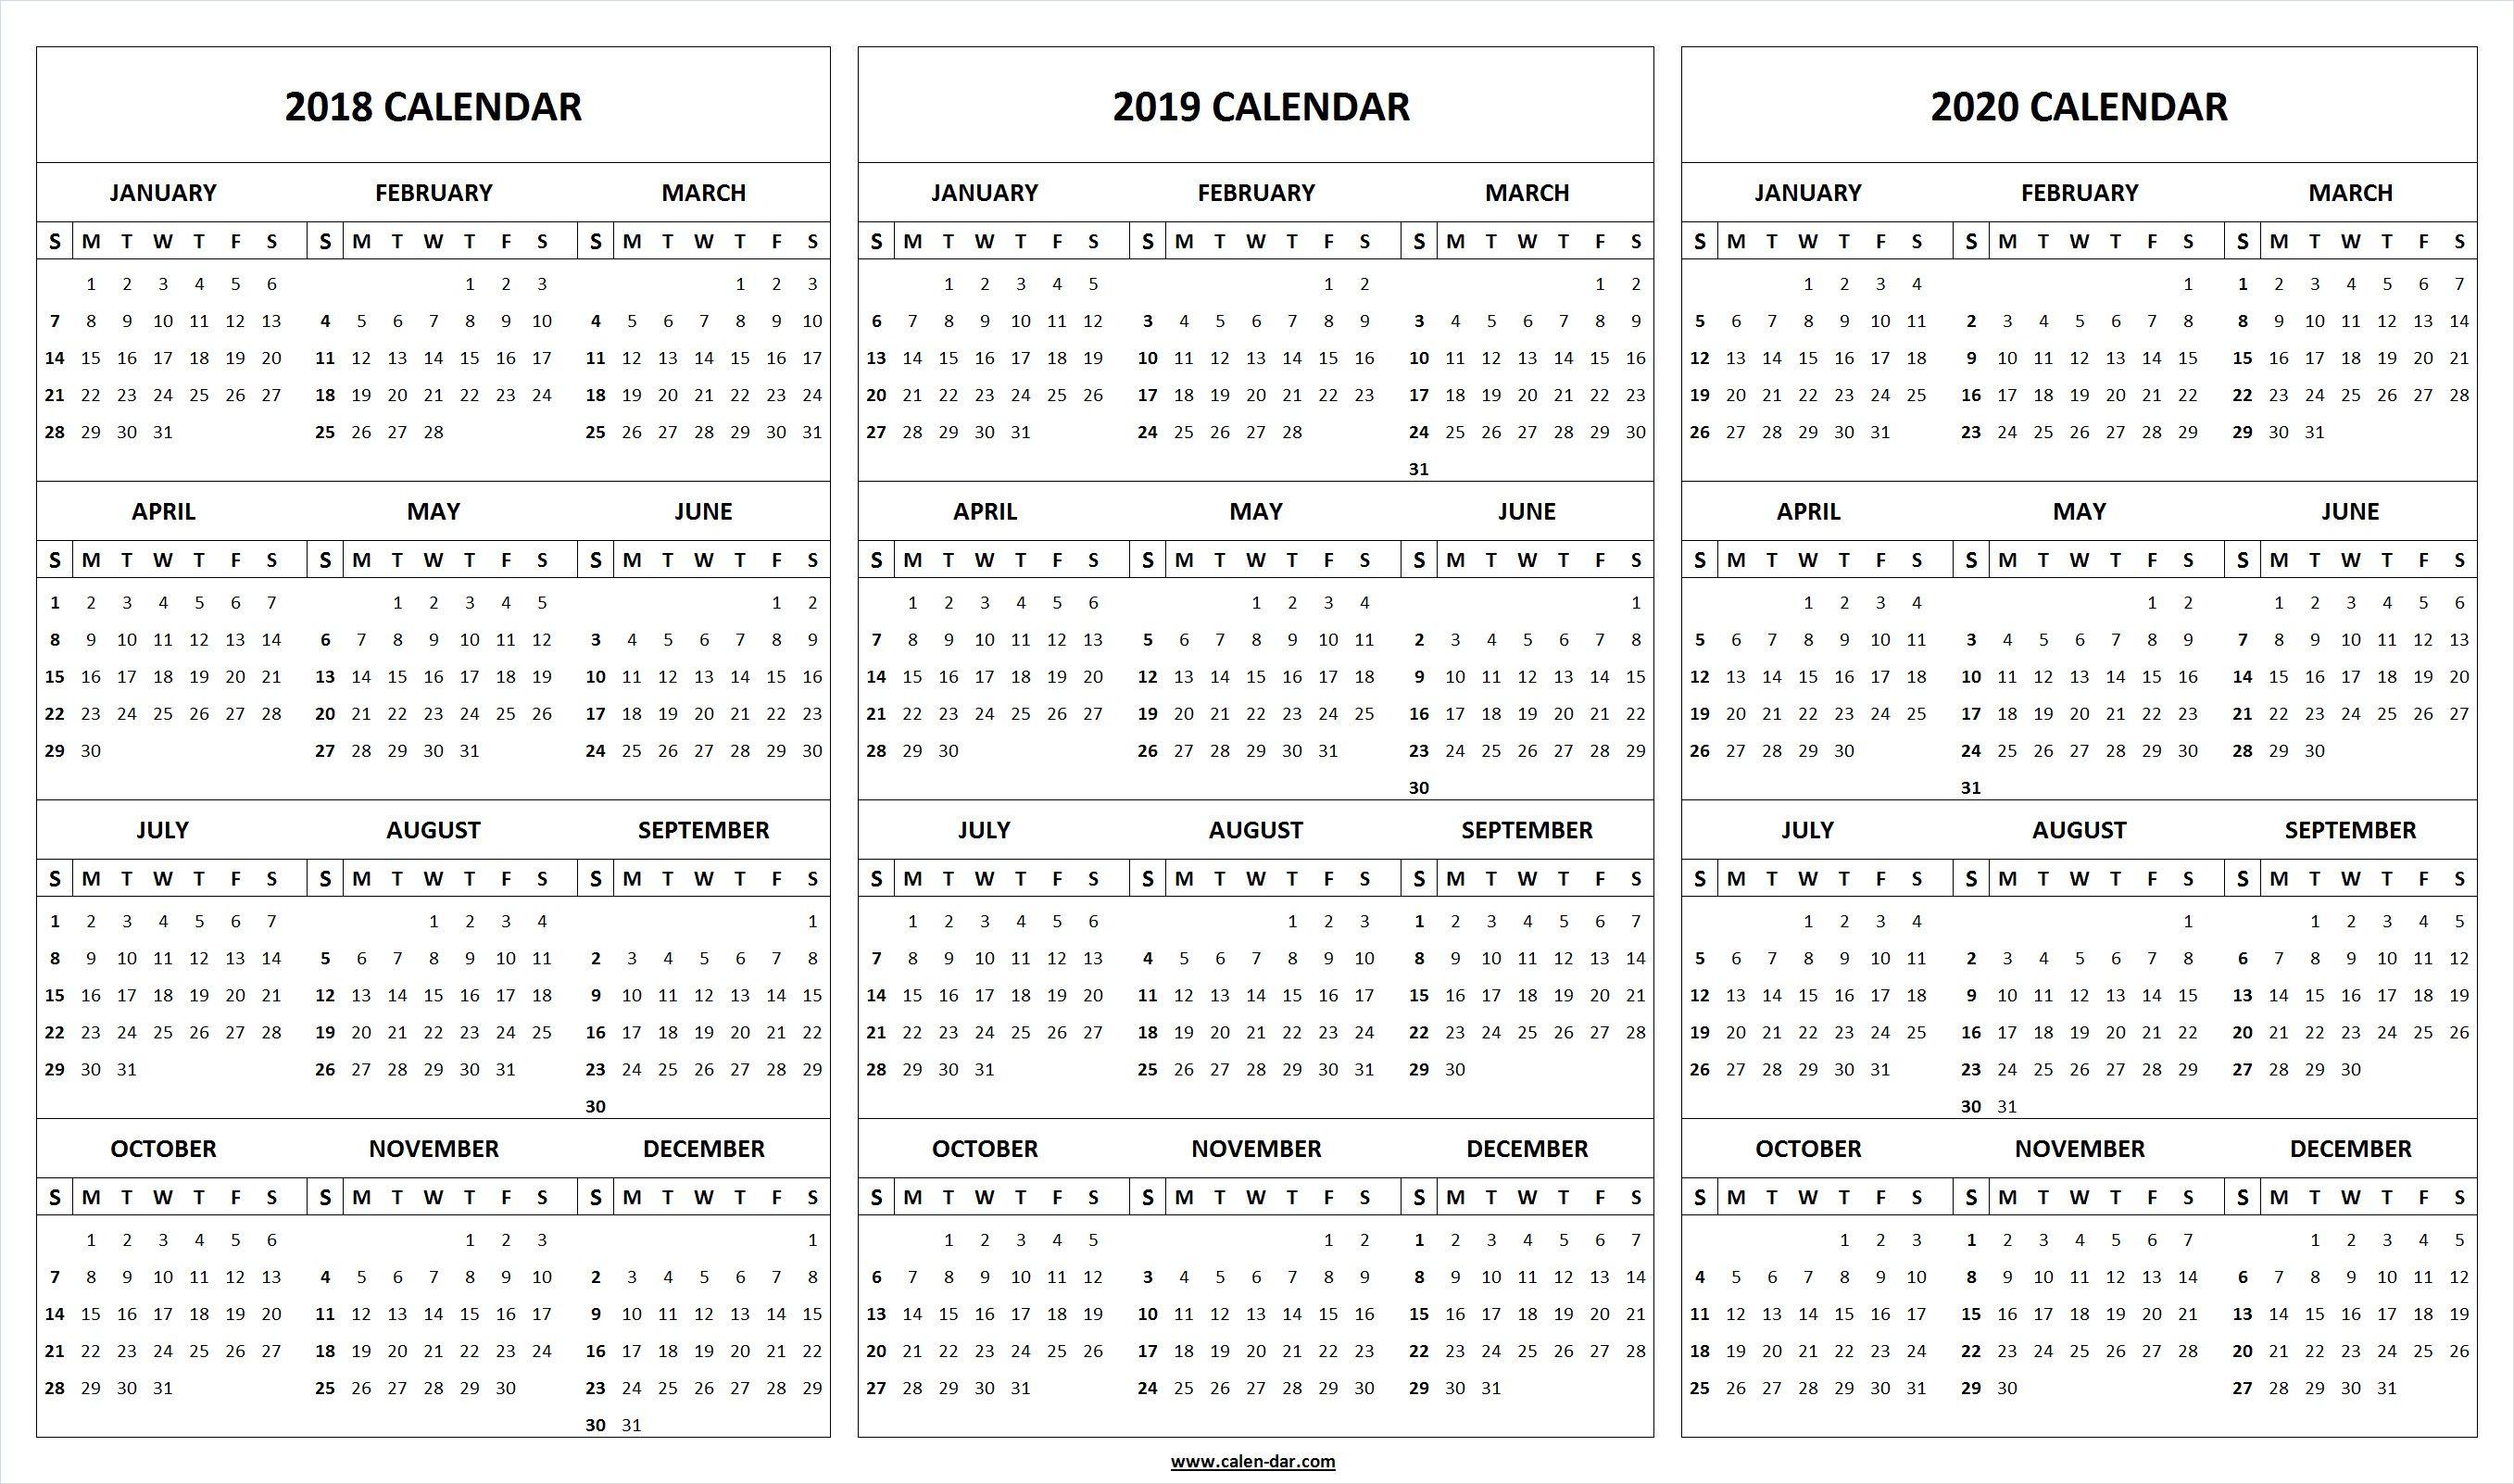 Print Blank 2018 2019 2020 Calendar Template | Organize